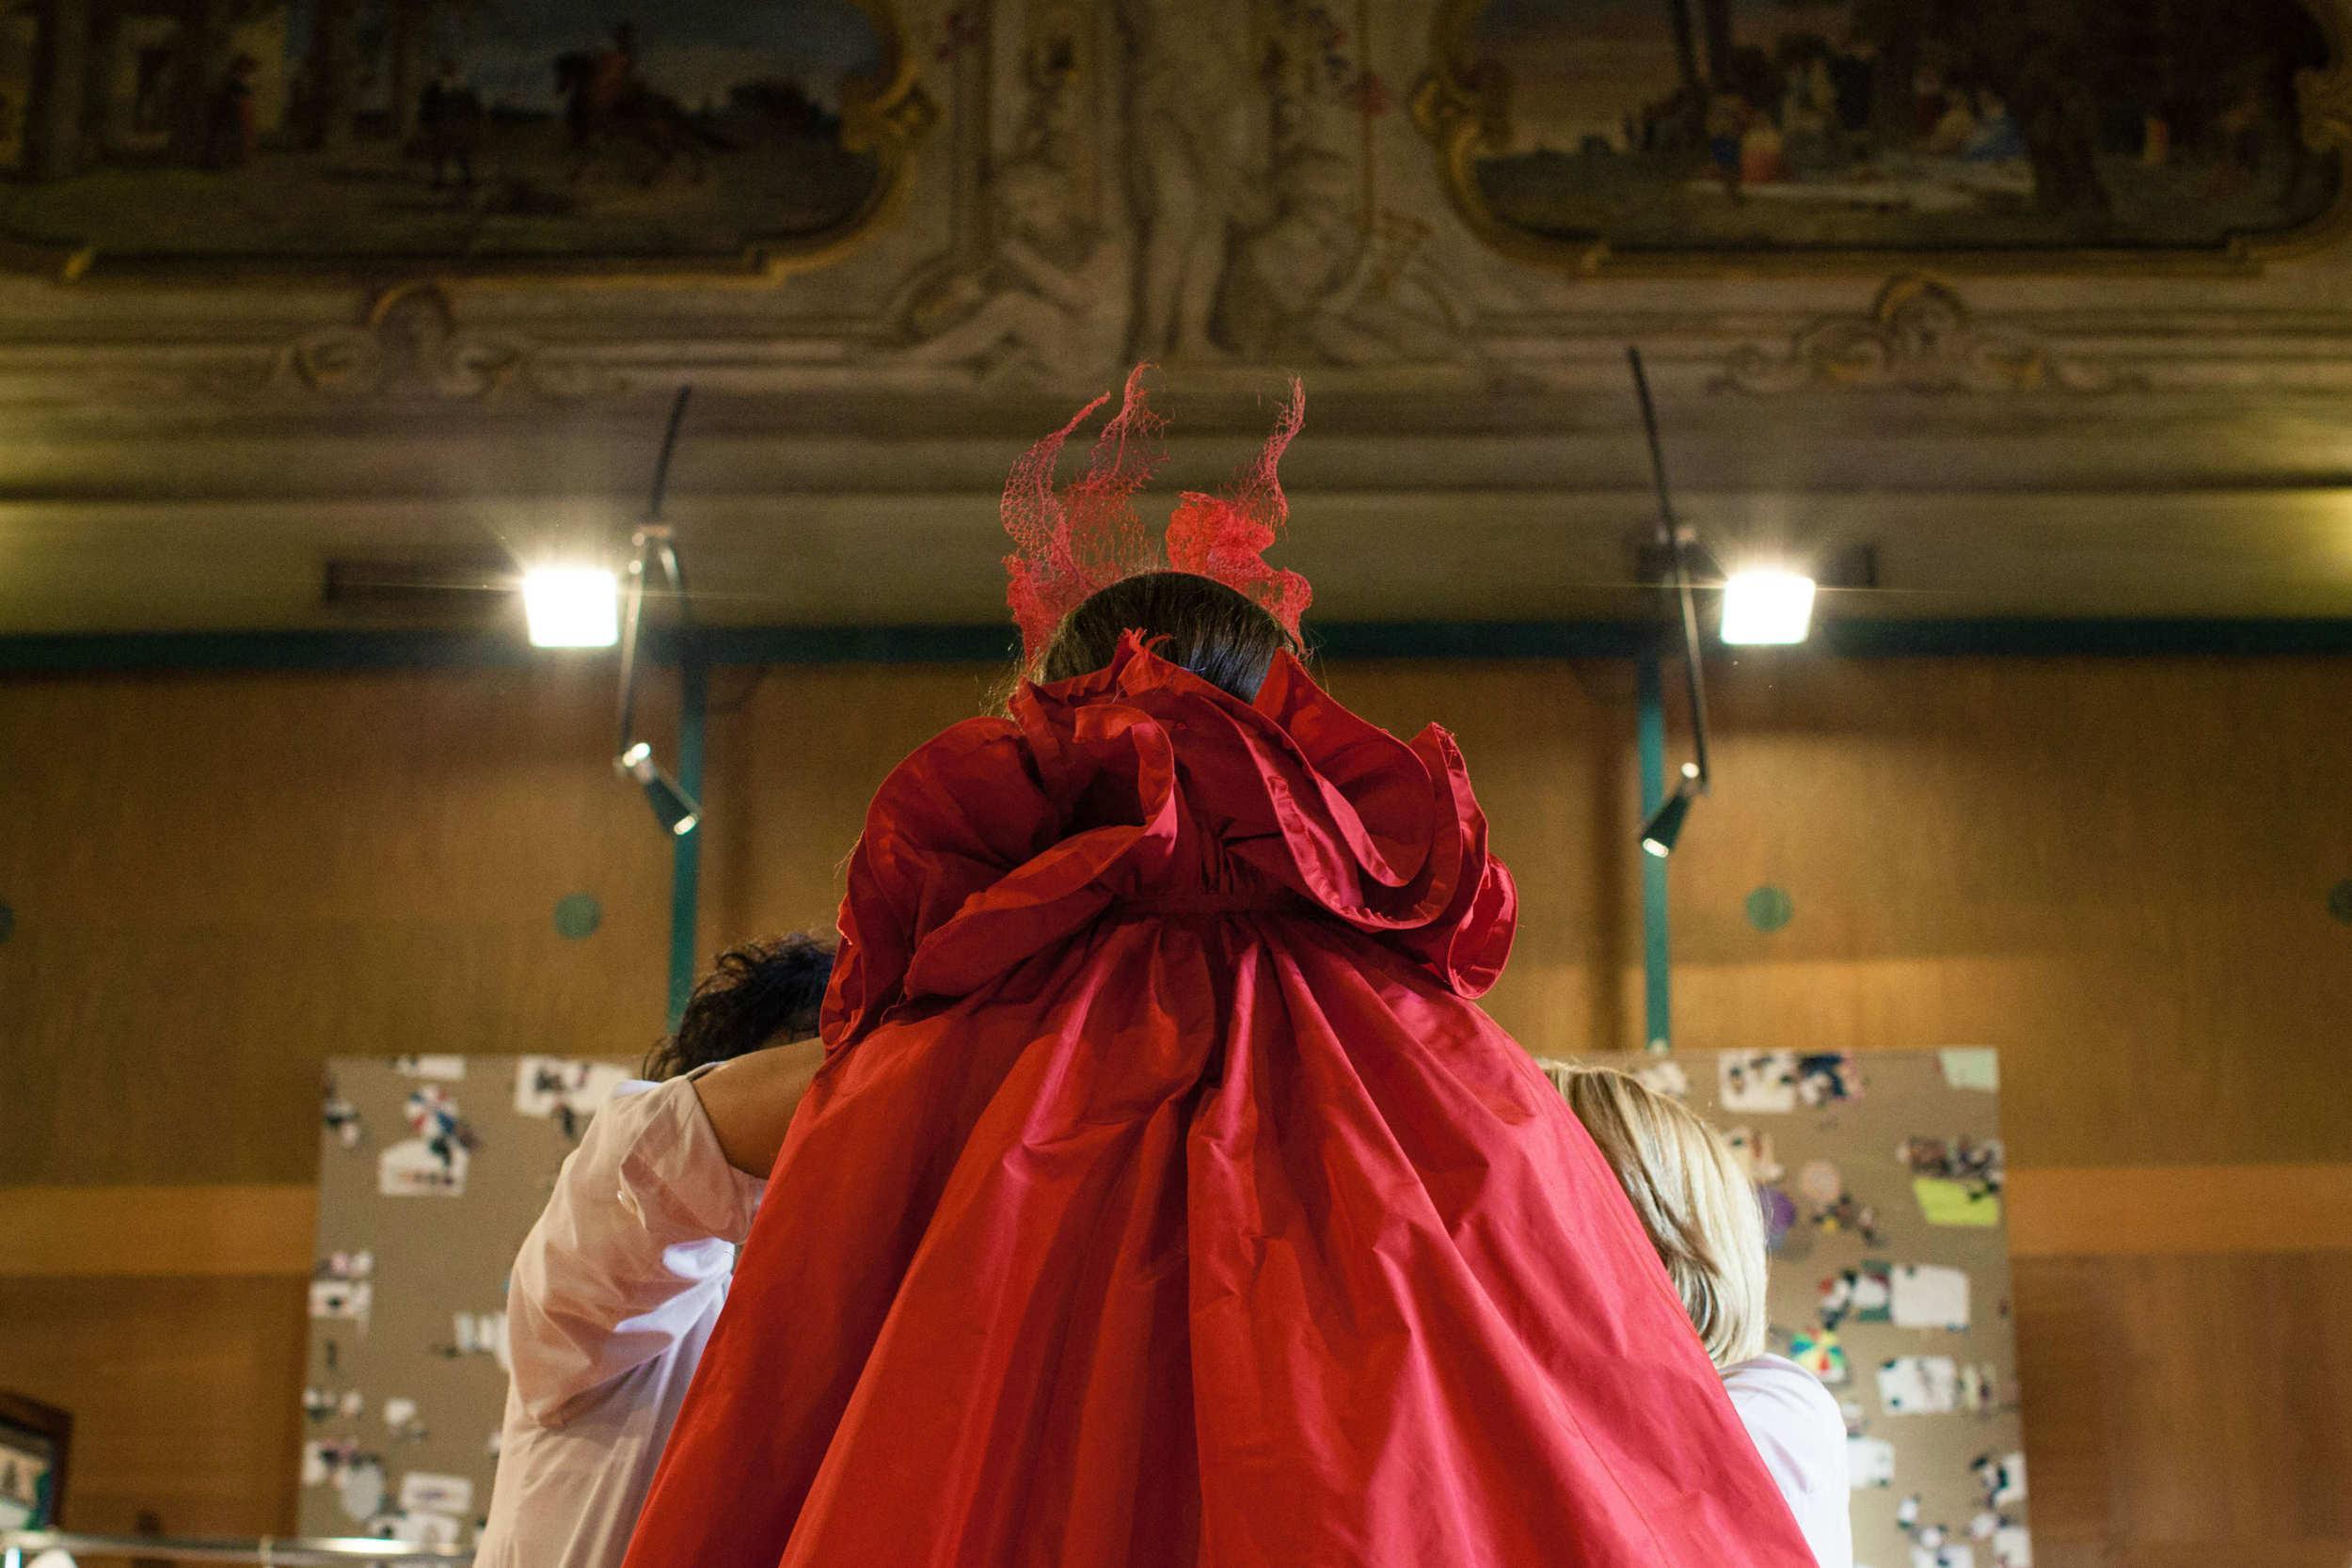 la-traviata-valentino-006.jpg